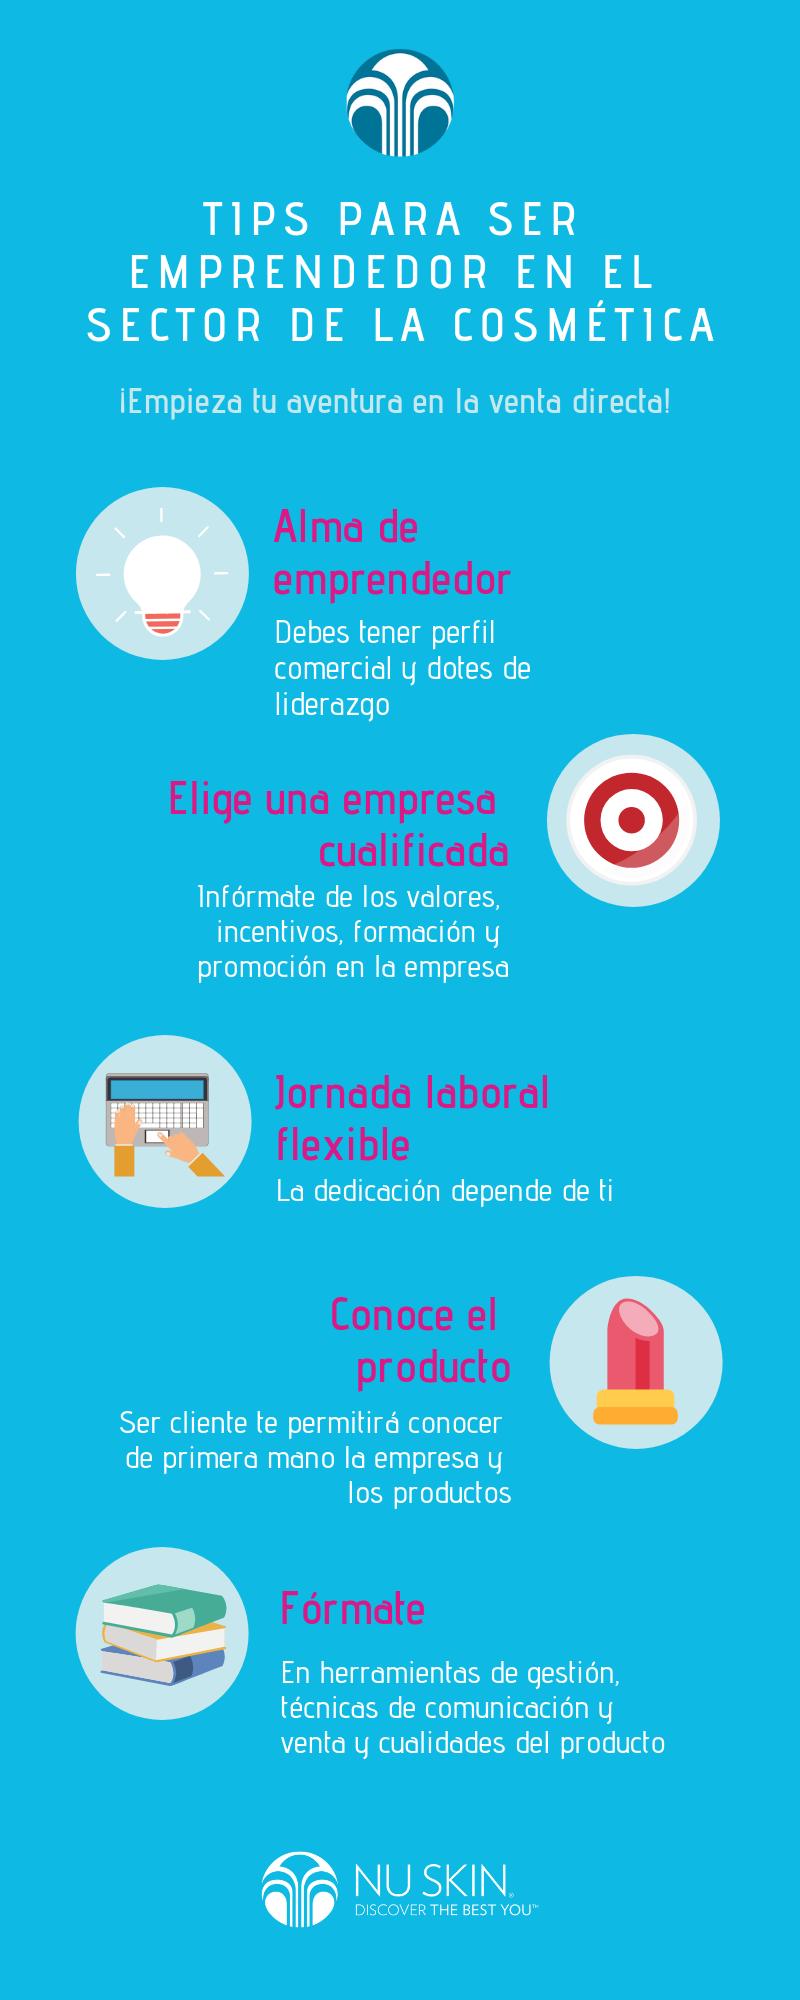 alt - https://static.comunicae.com/photos/notas/1203167/1553507962_NuSkinTips_para_ser_emprendedor_en_el_sector_de_la_cosmetica.png